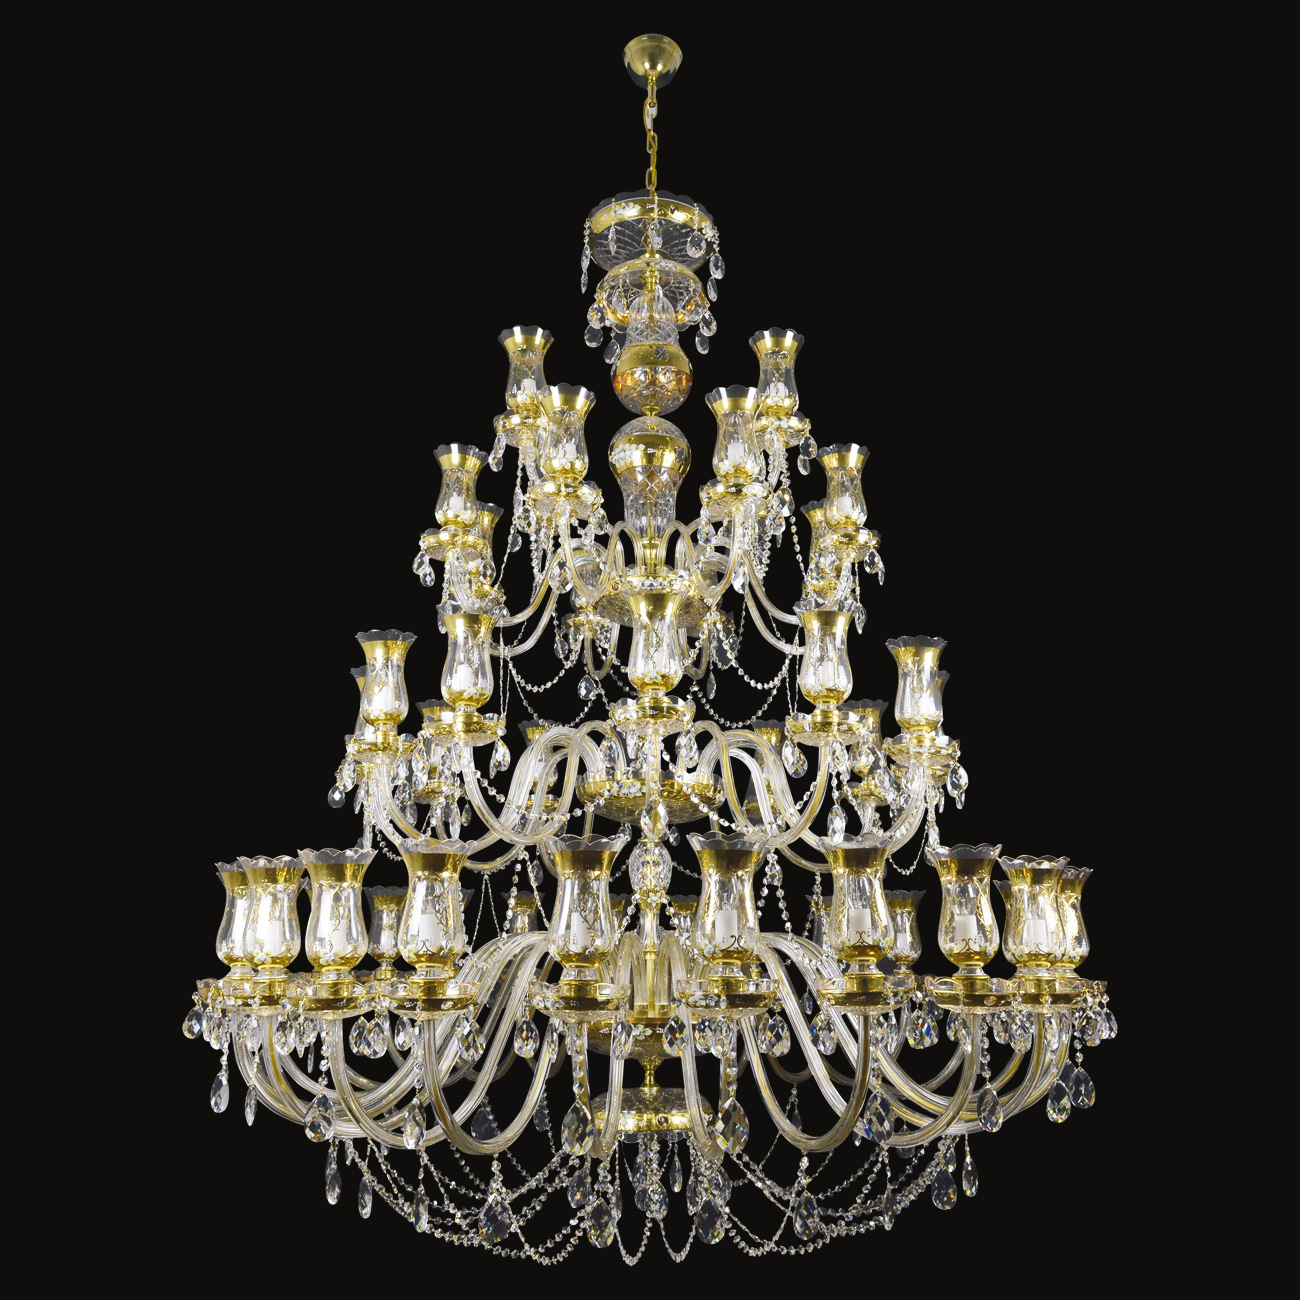 48 lights - Ø 165 x H 205 cm